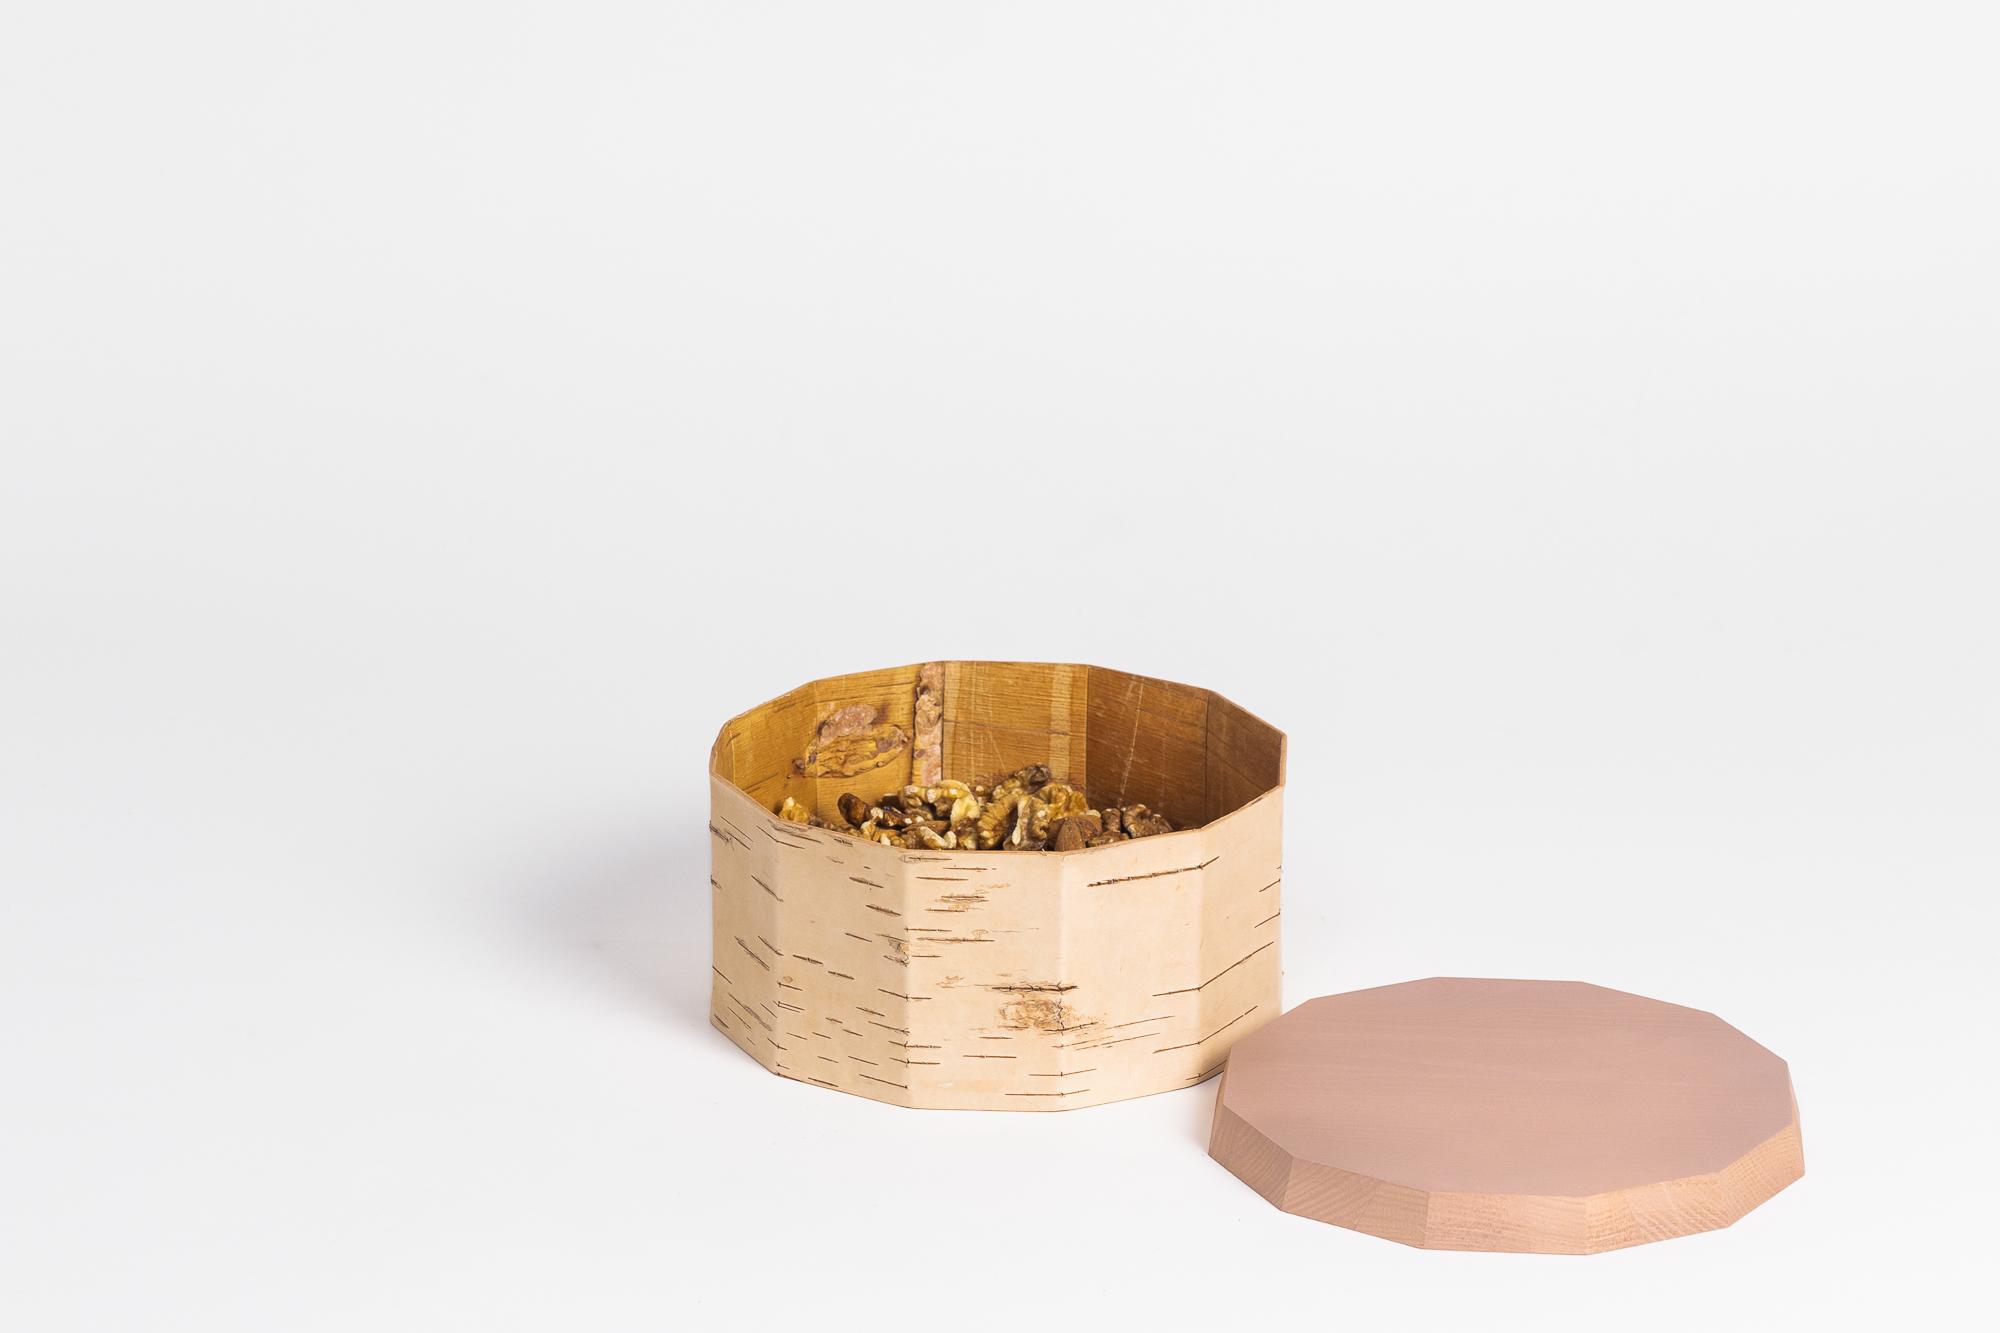 Tuesa Cookie Box